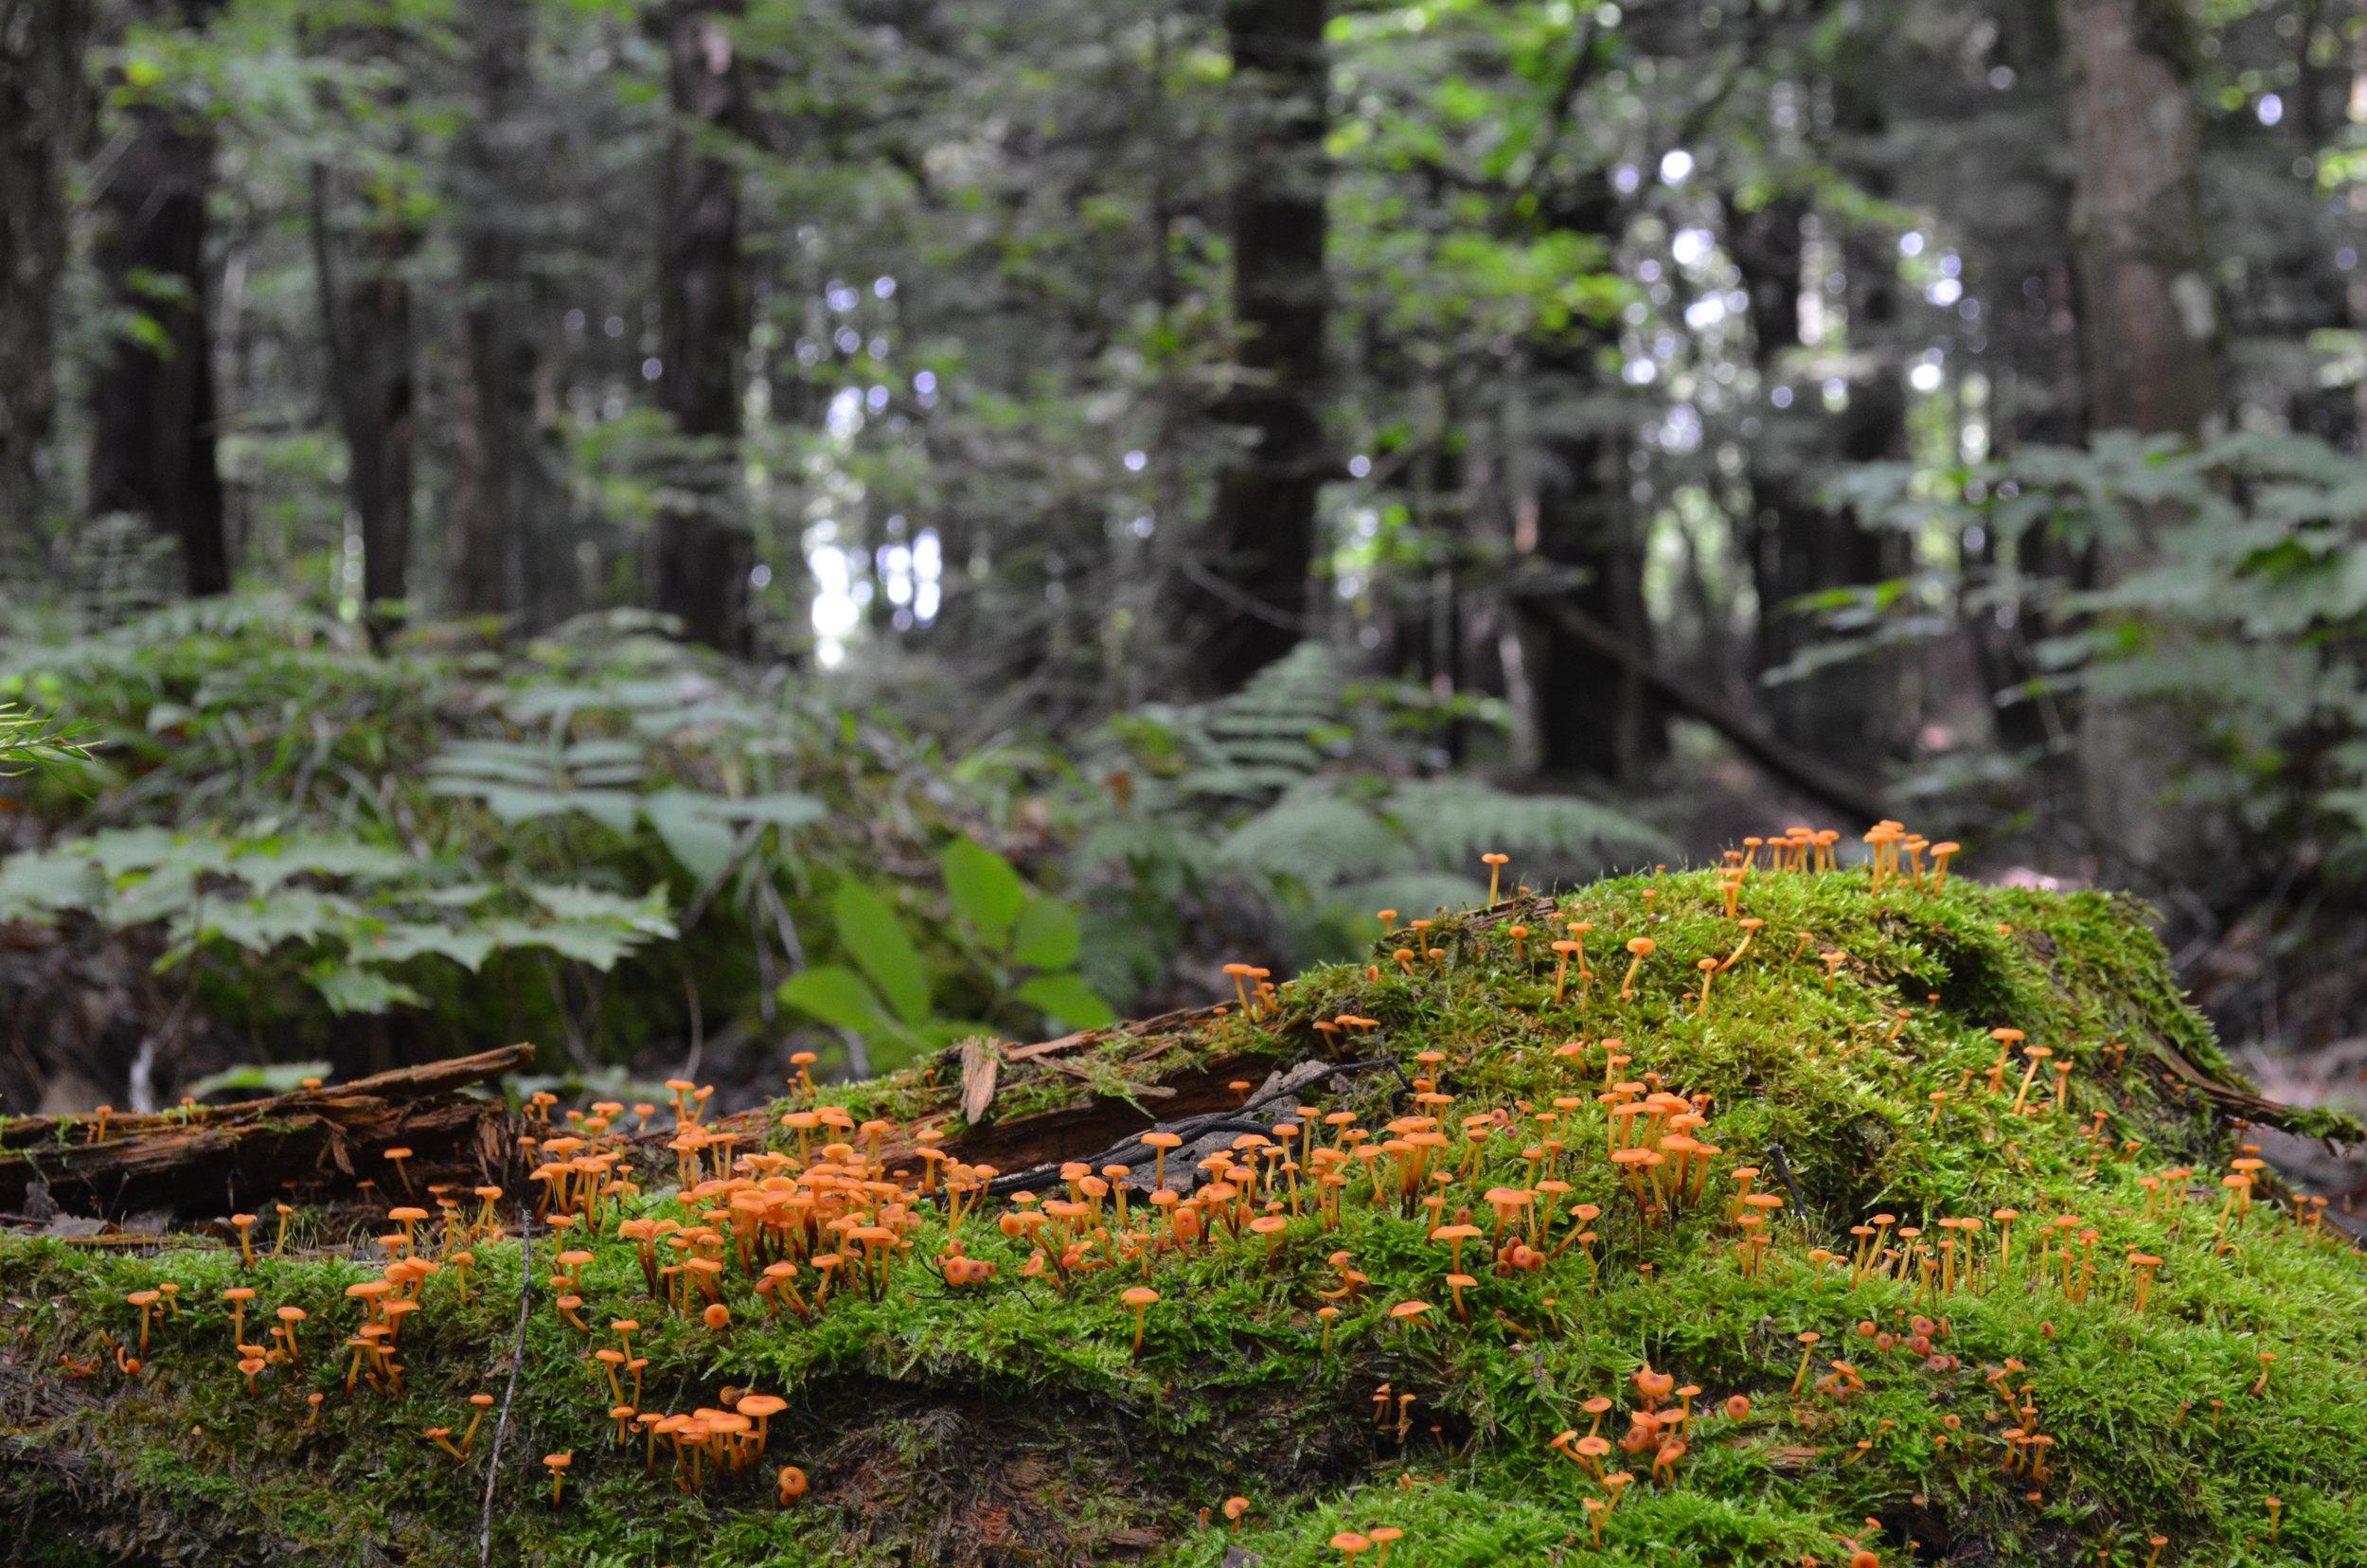 Mushrooms along the trail